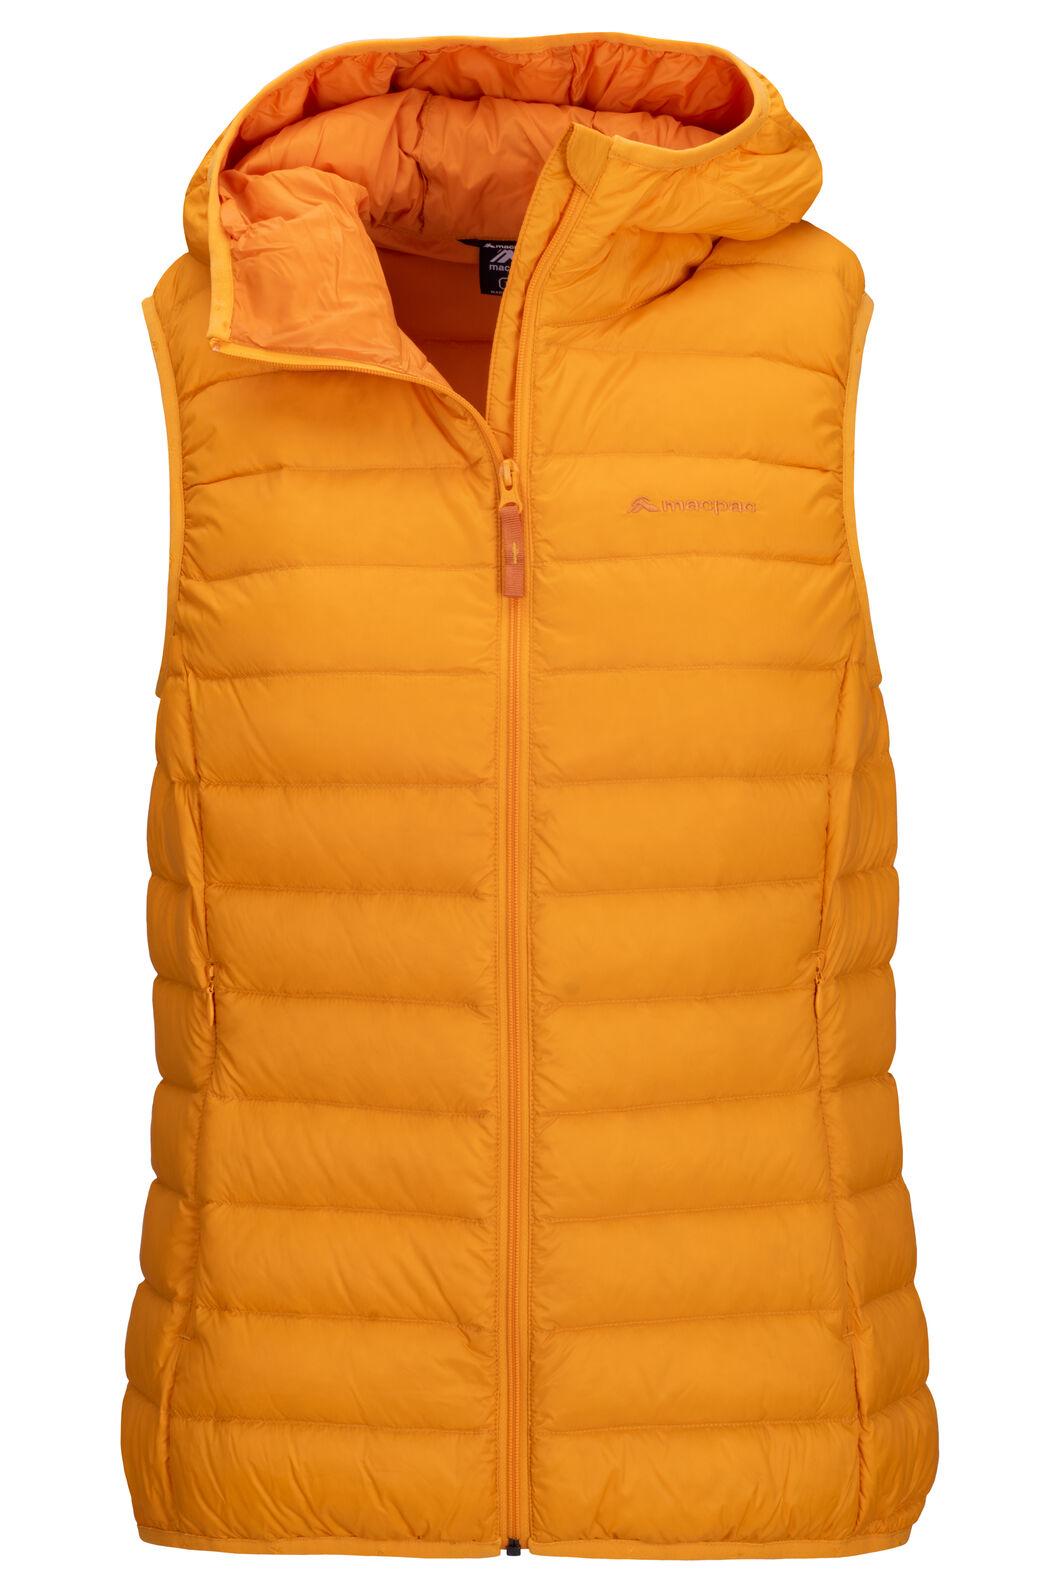 Macpac Uber Light Hooded Down Vest — Women's, Cadmium Yellow, hi-res